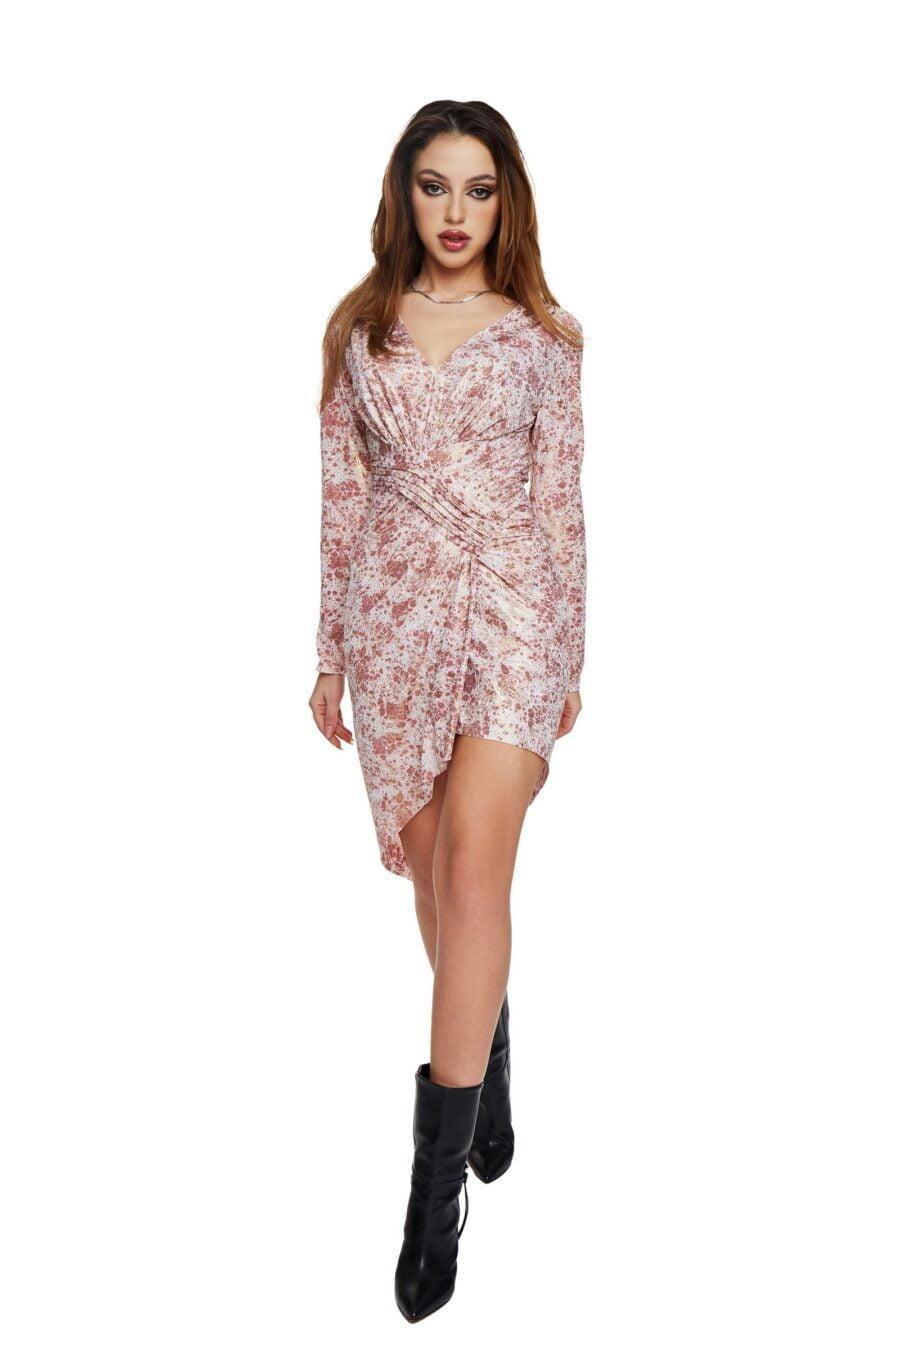 long-sleeved pleated dress!